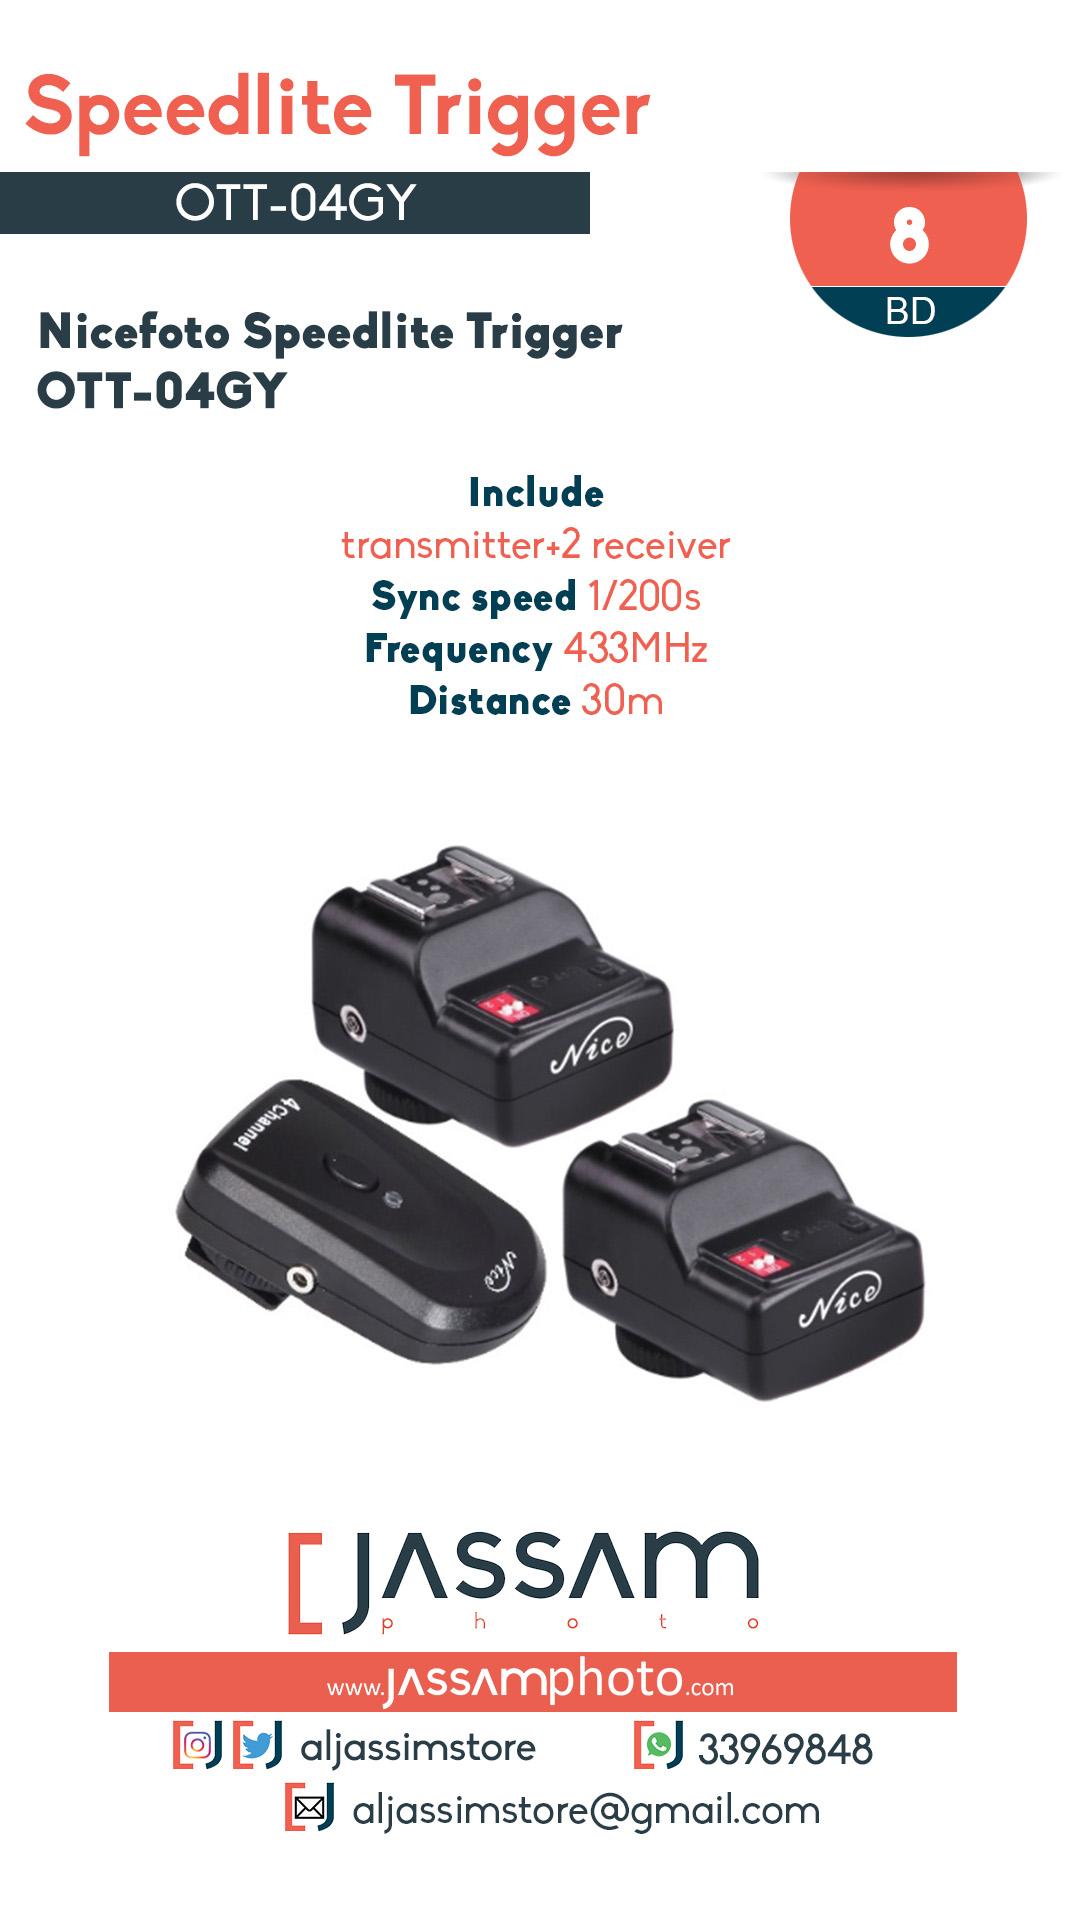 Speedlite Trigger OTT-04GY